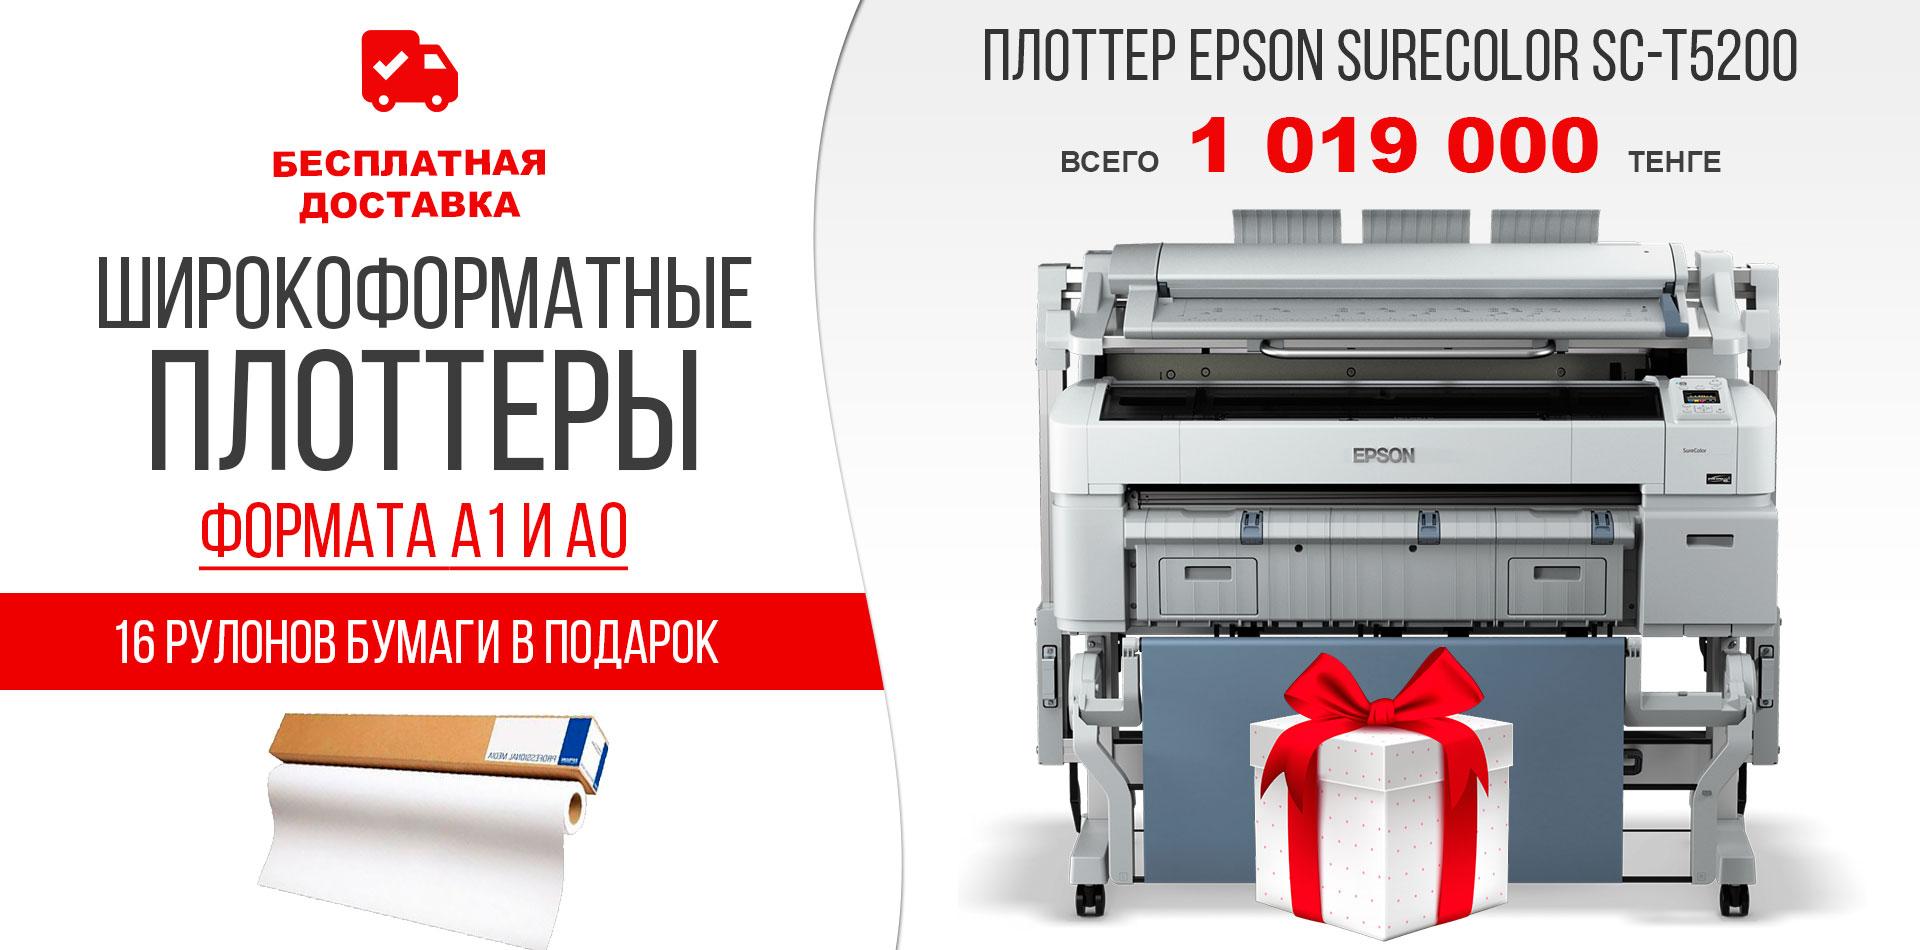 EPSON SC-T5200 В АСТАНЕ.